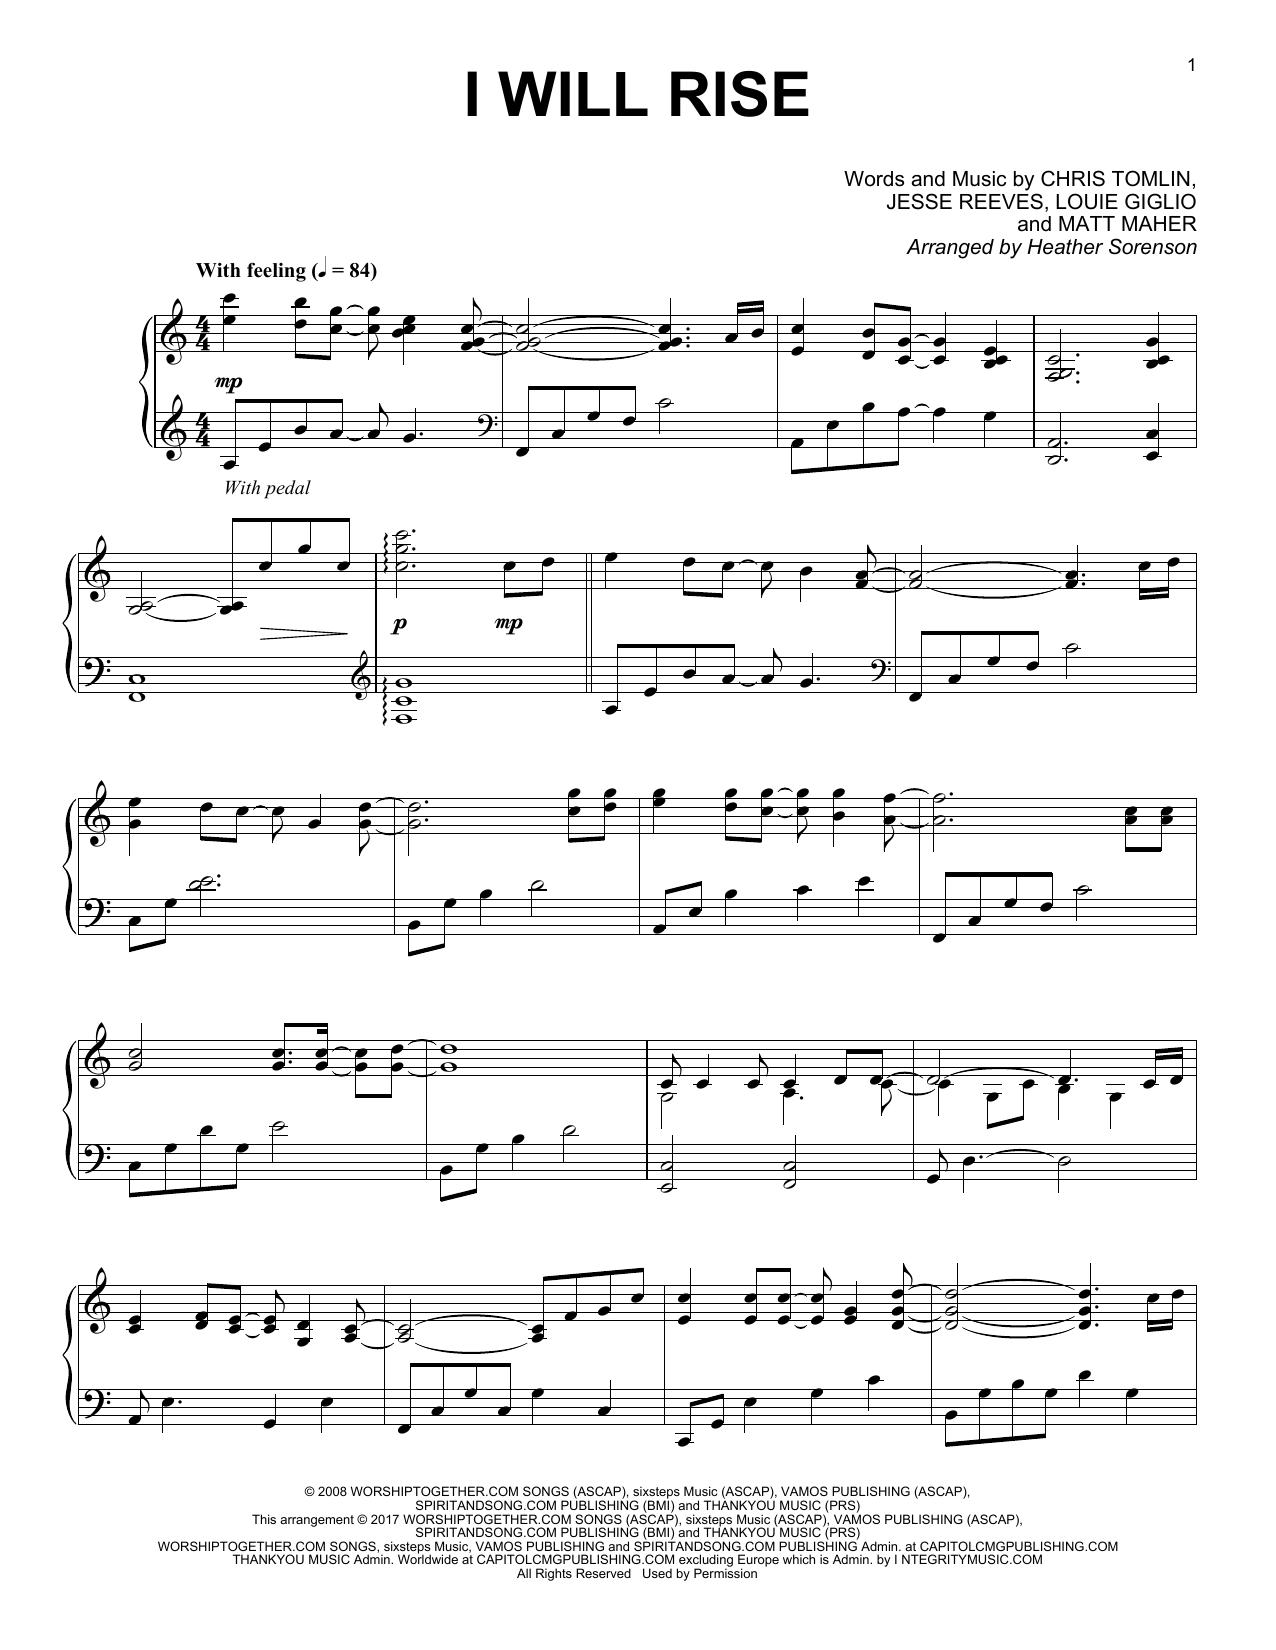 Sheet Music Digital Files To Print Licensed Chris Tomlin Digital